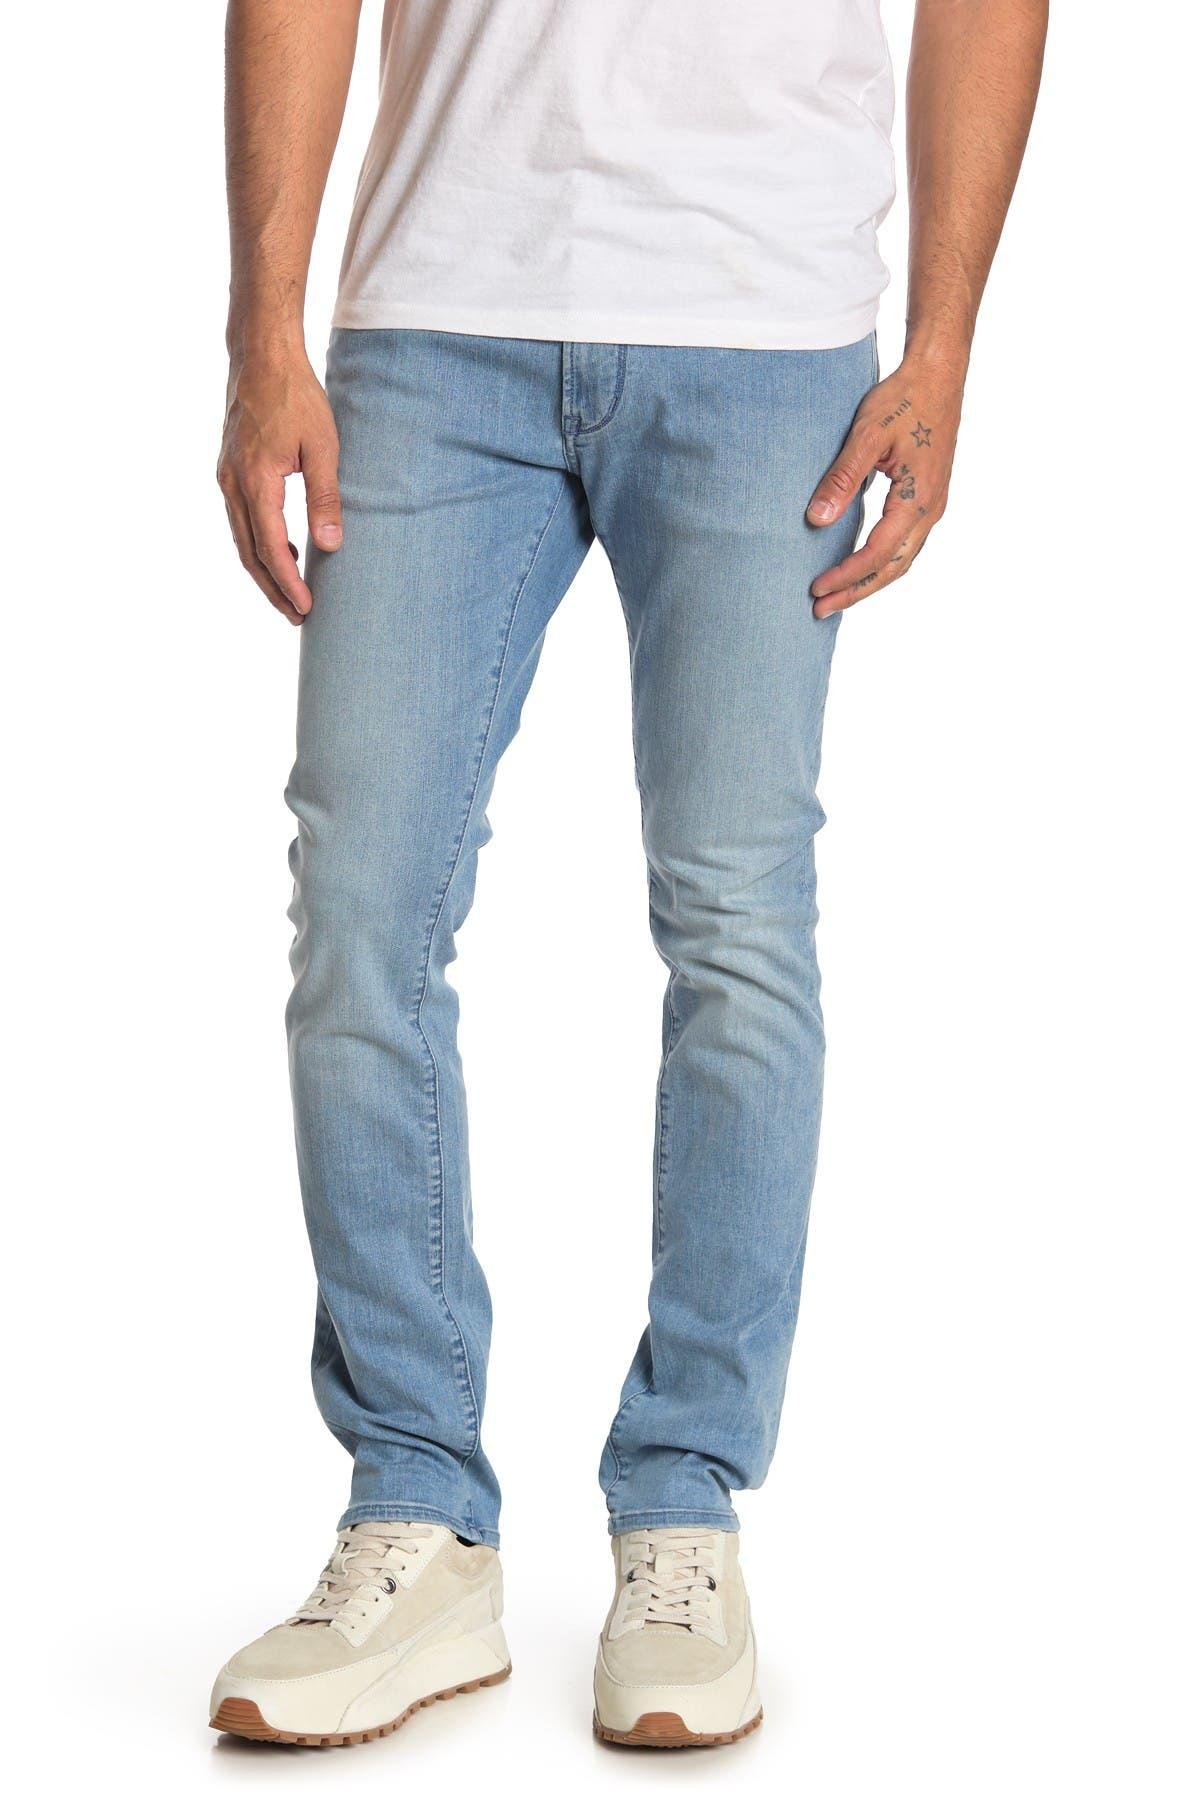 navy $45.00 BLKWD The Standard Jeans BW0001NVY